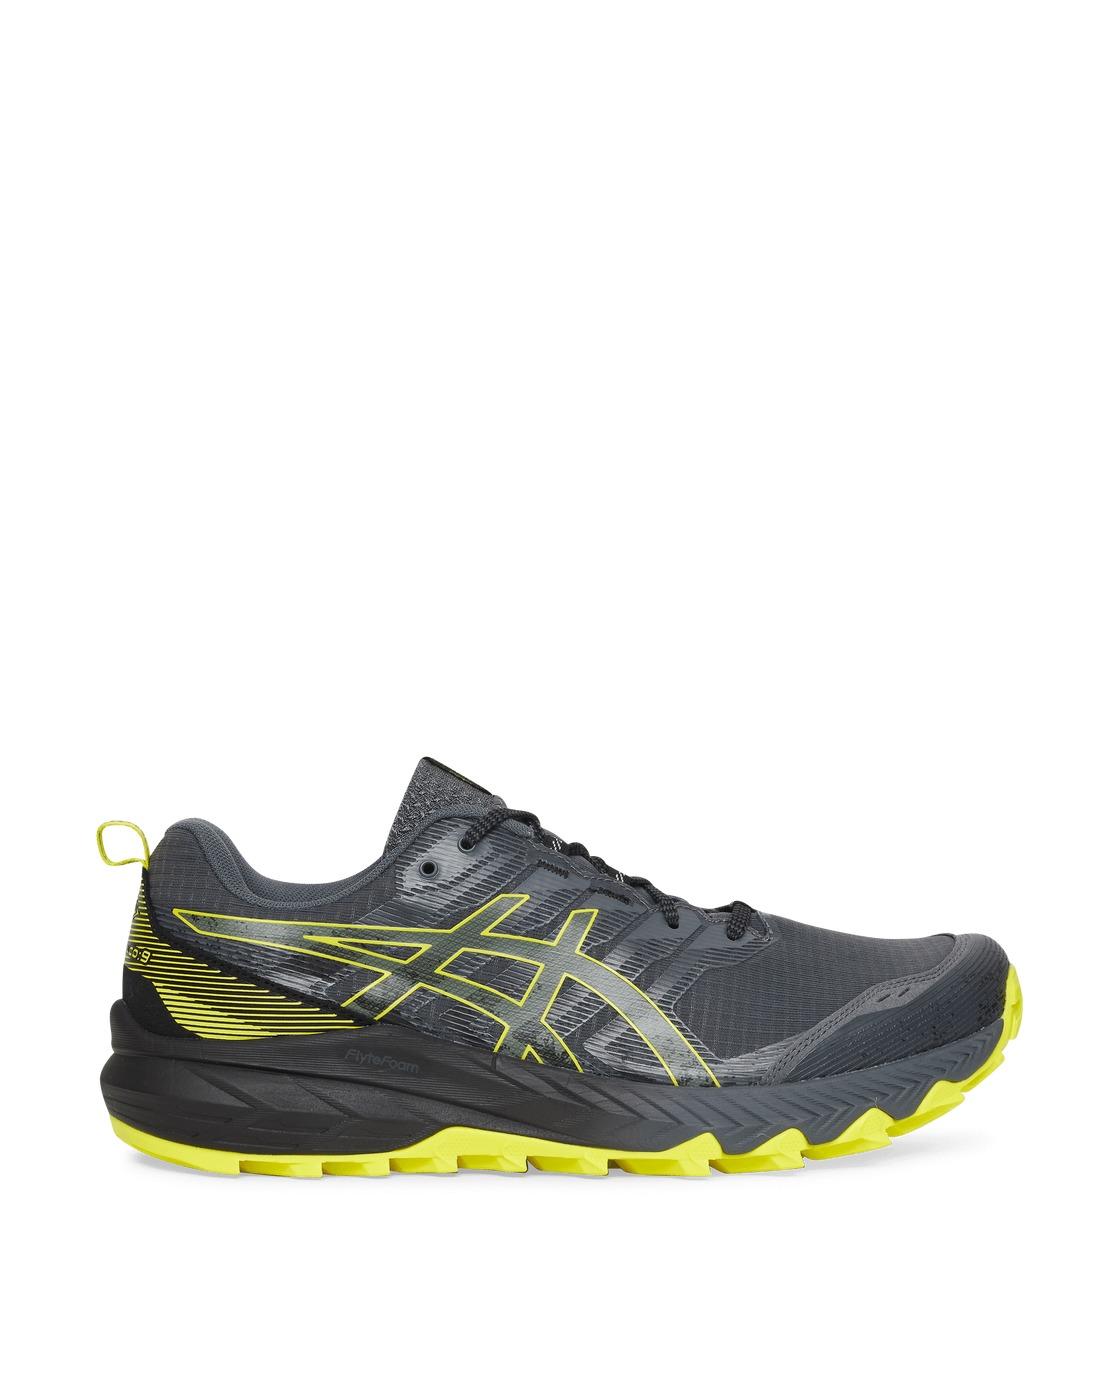 Asics Gel Trabuco 9 Gtx Sneakers Carrier Grey/Sour Yuzu